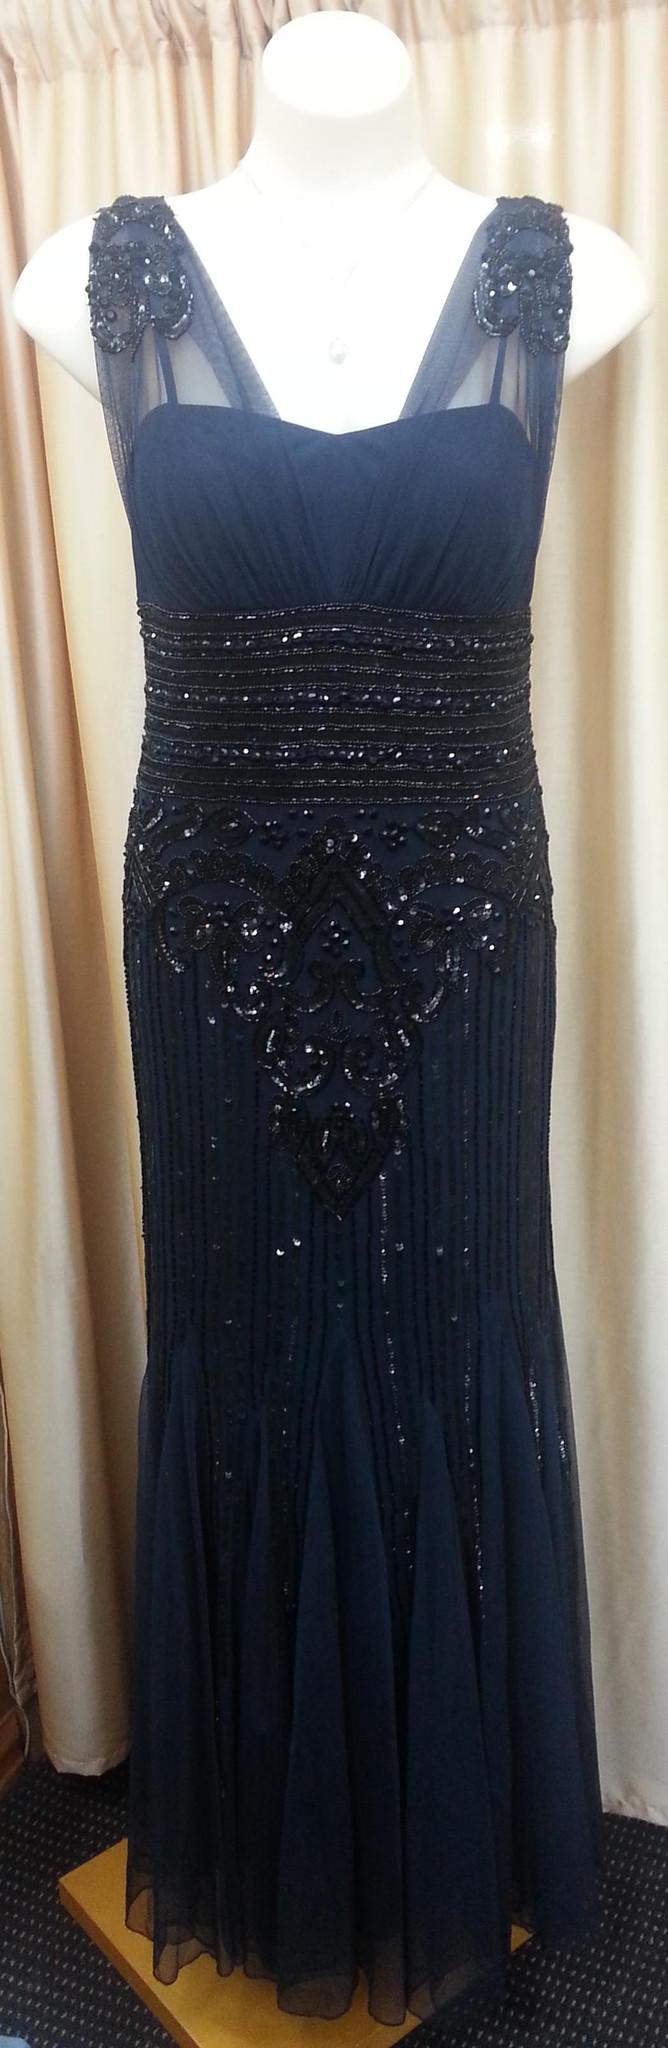 Long dress products long elegant dresses and mesh